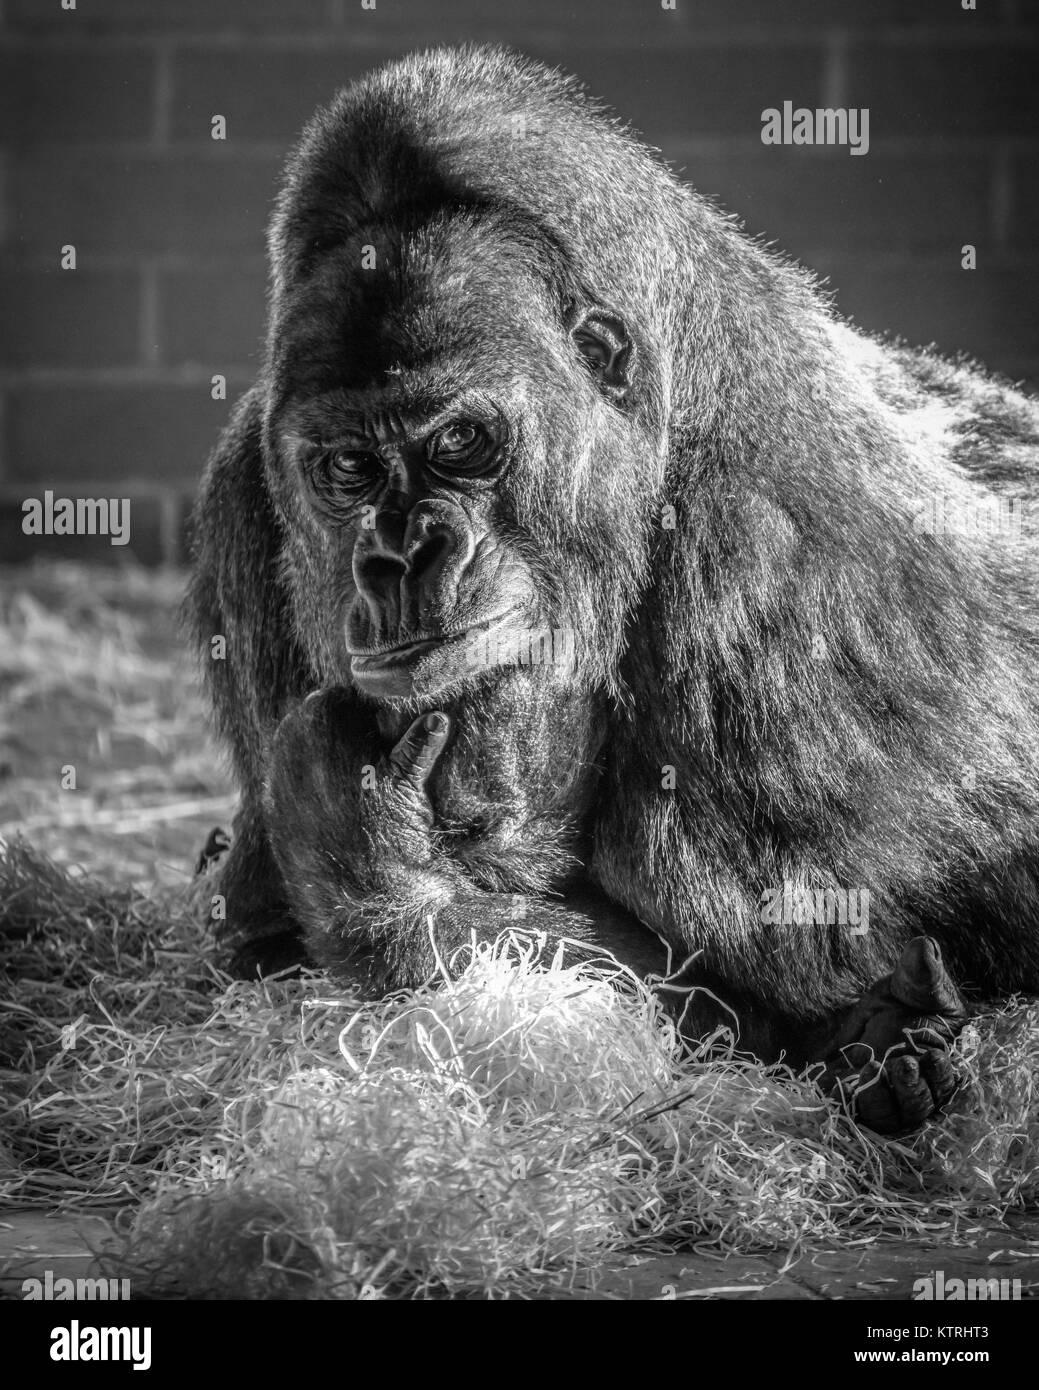 Western Lowland Gorillas - Stock Image